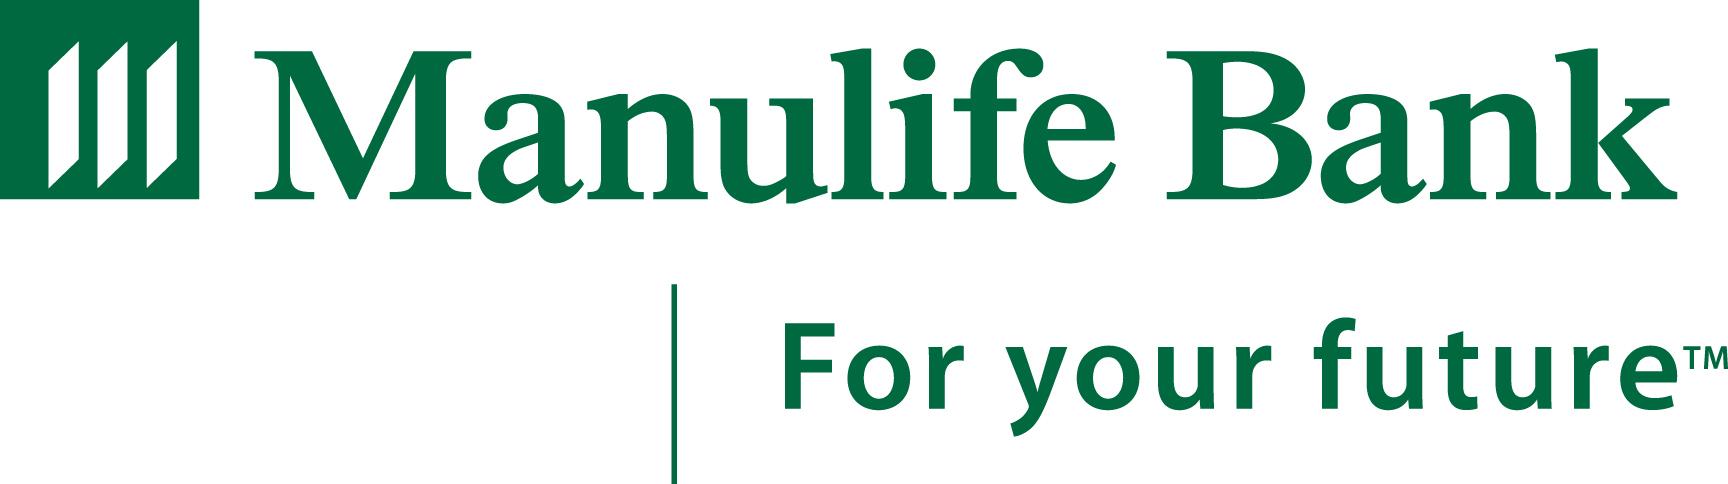 Manulife_Bank_Colour_Logo_JPG.jpg